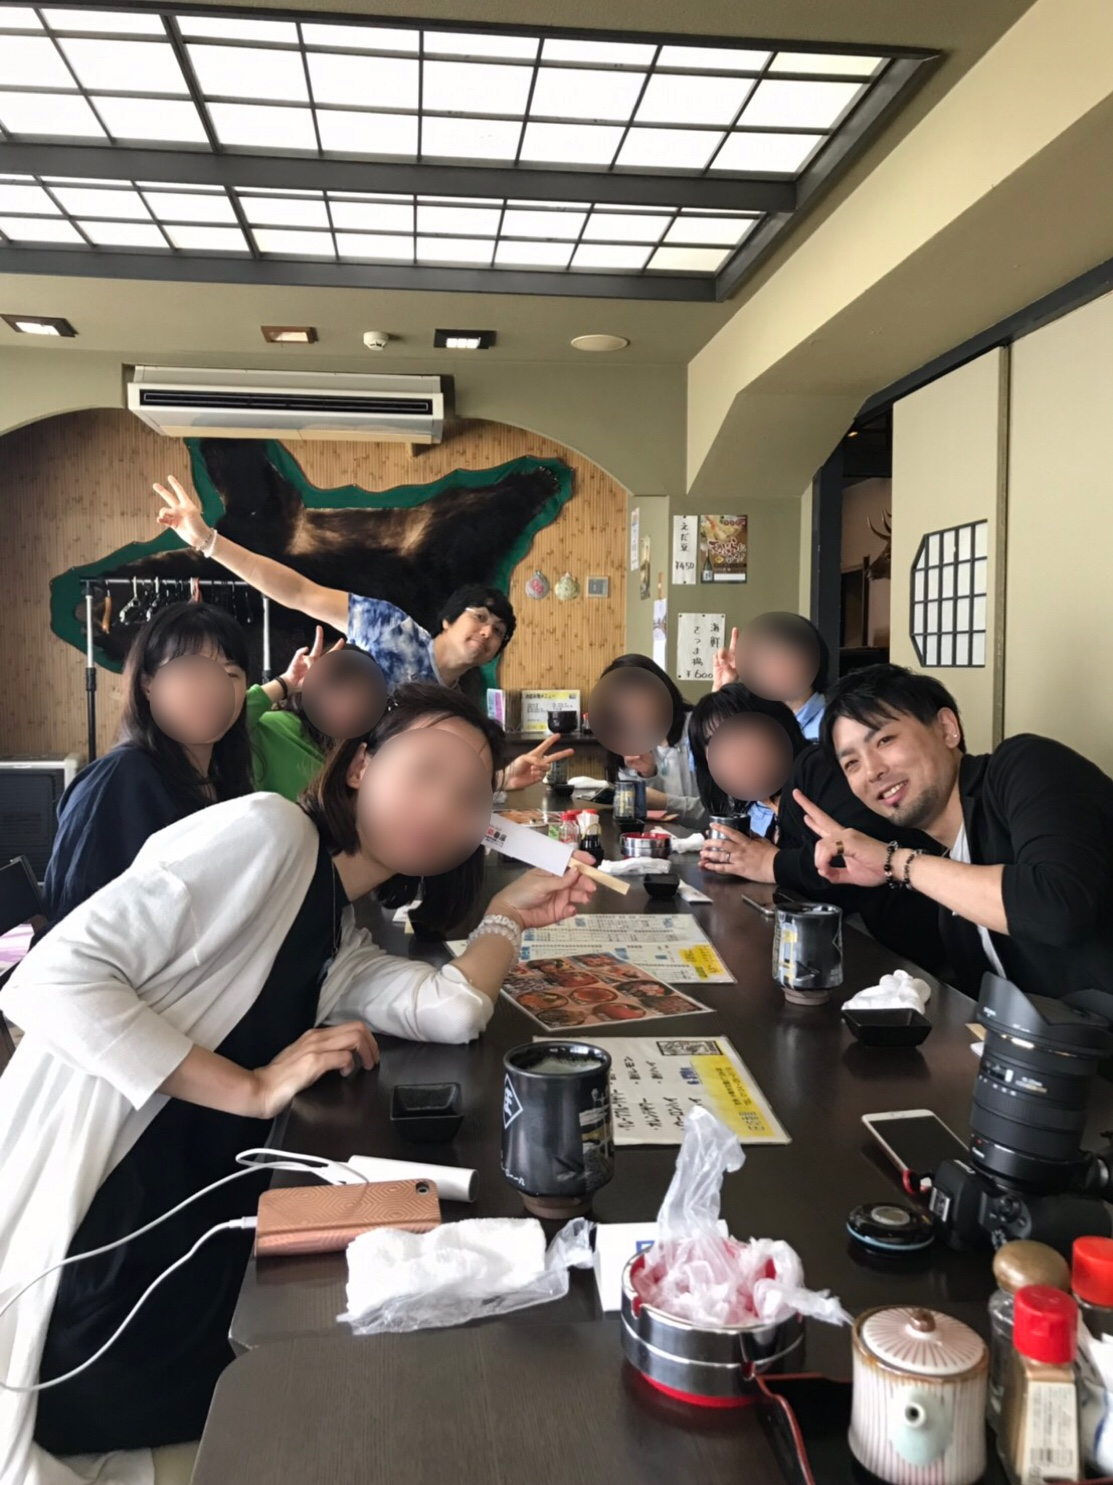 img 7697 - ナインハピネスプロ@in札幌合宿